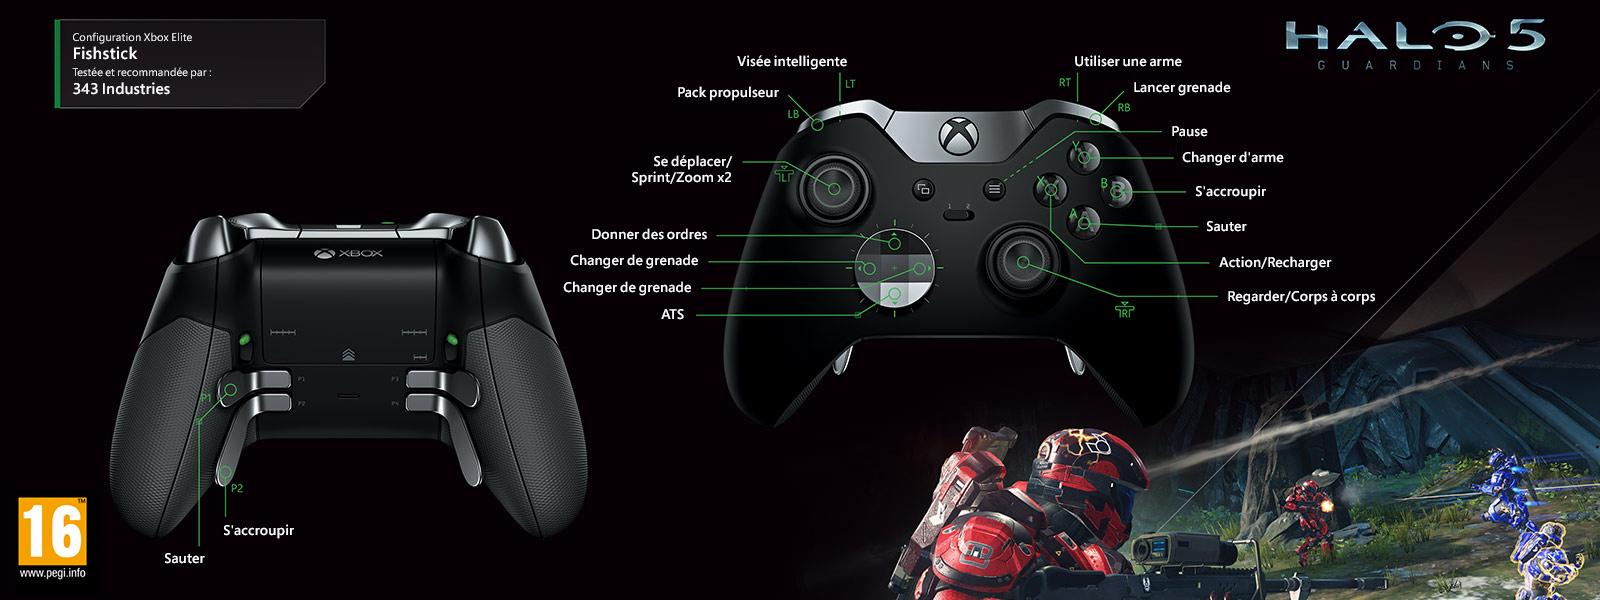 Halo5, configuration Elite Fishstick